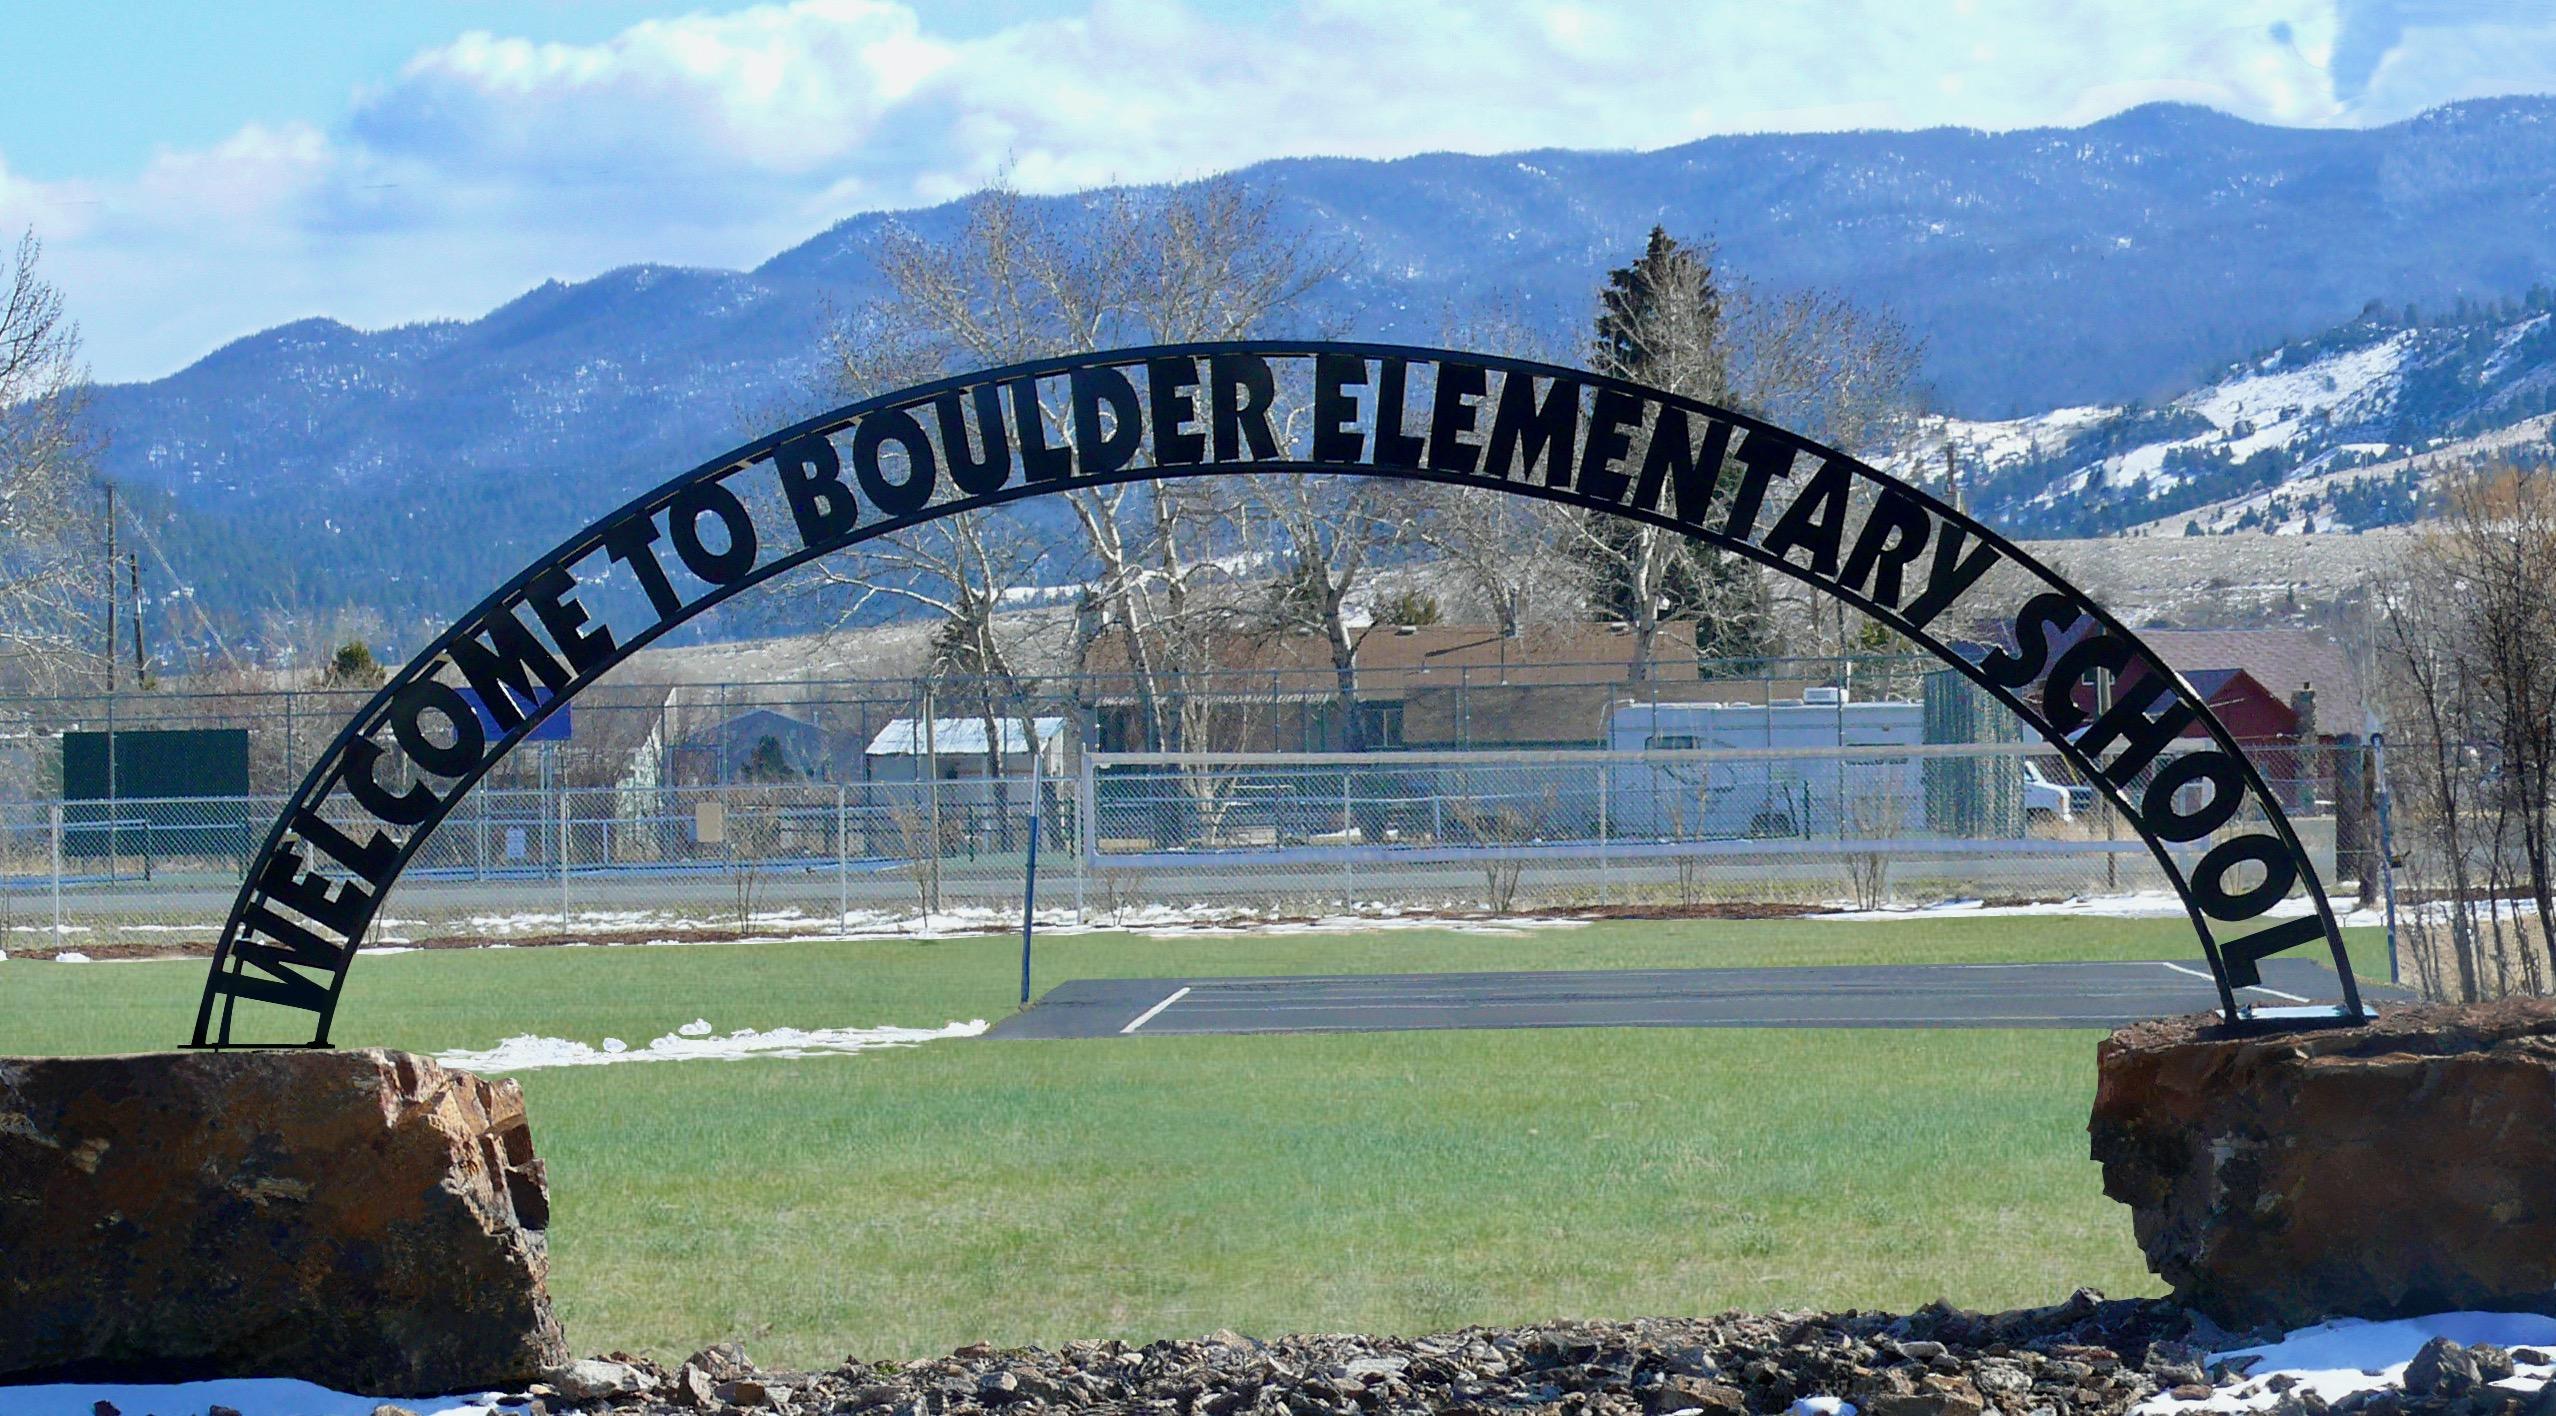 Boulder Elementary